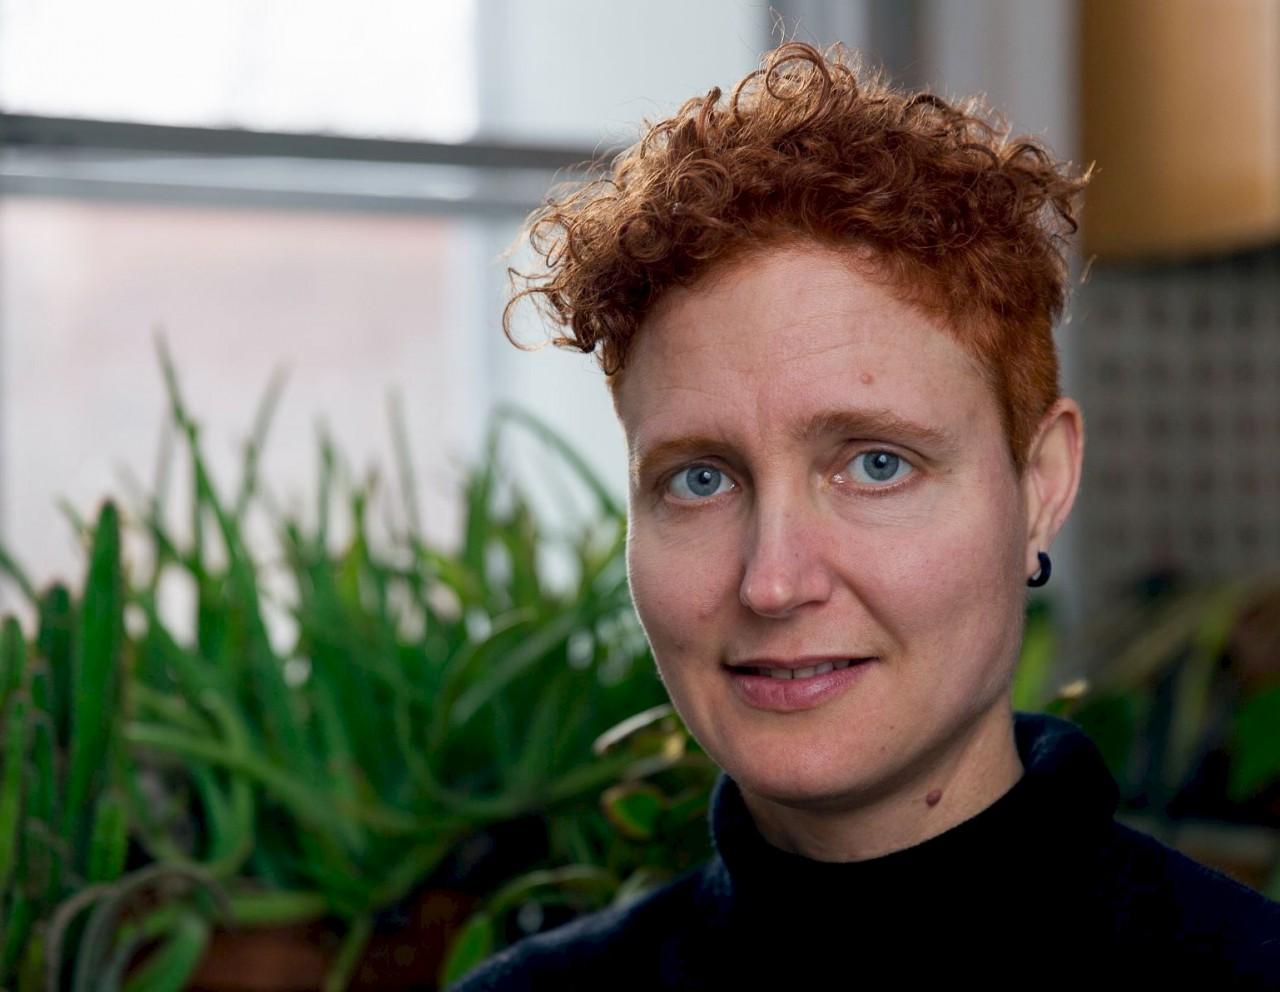 Mietergemeinschaft Rudolf Lehmbruck e.V. Eugen-Helmlé-Übersetzerpreis 2019 für Sonja Finck